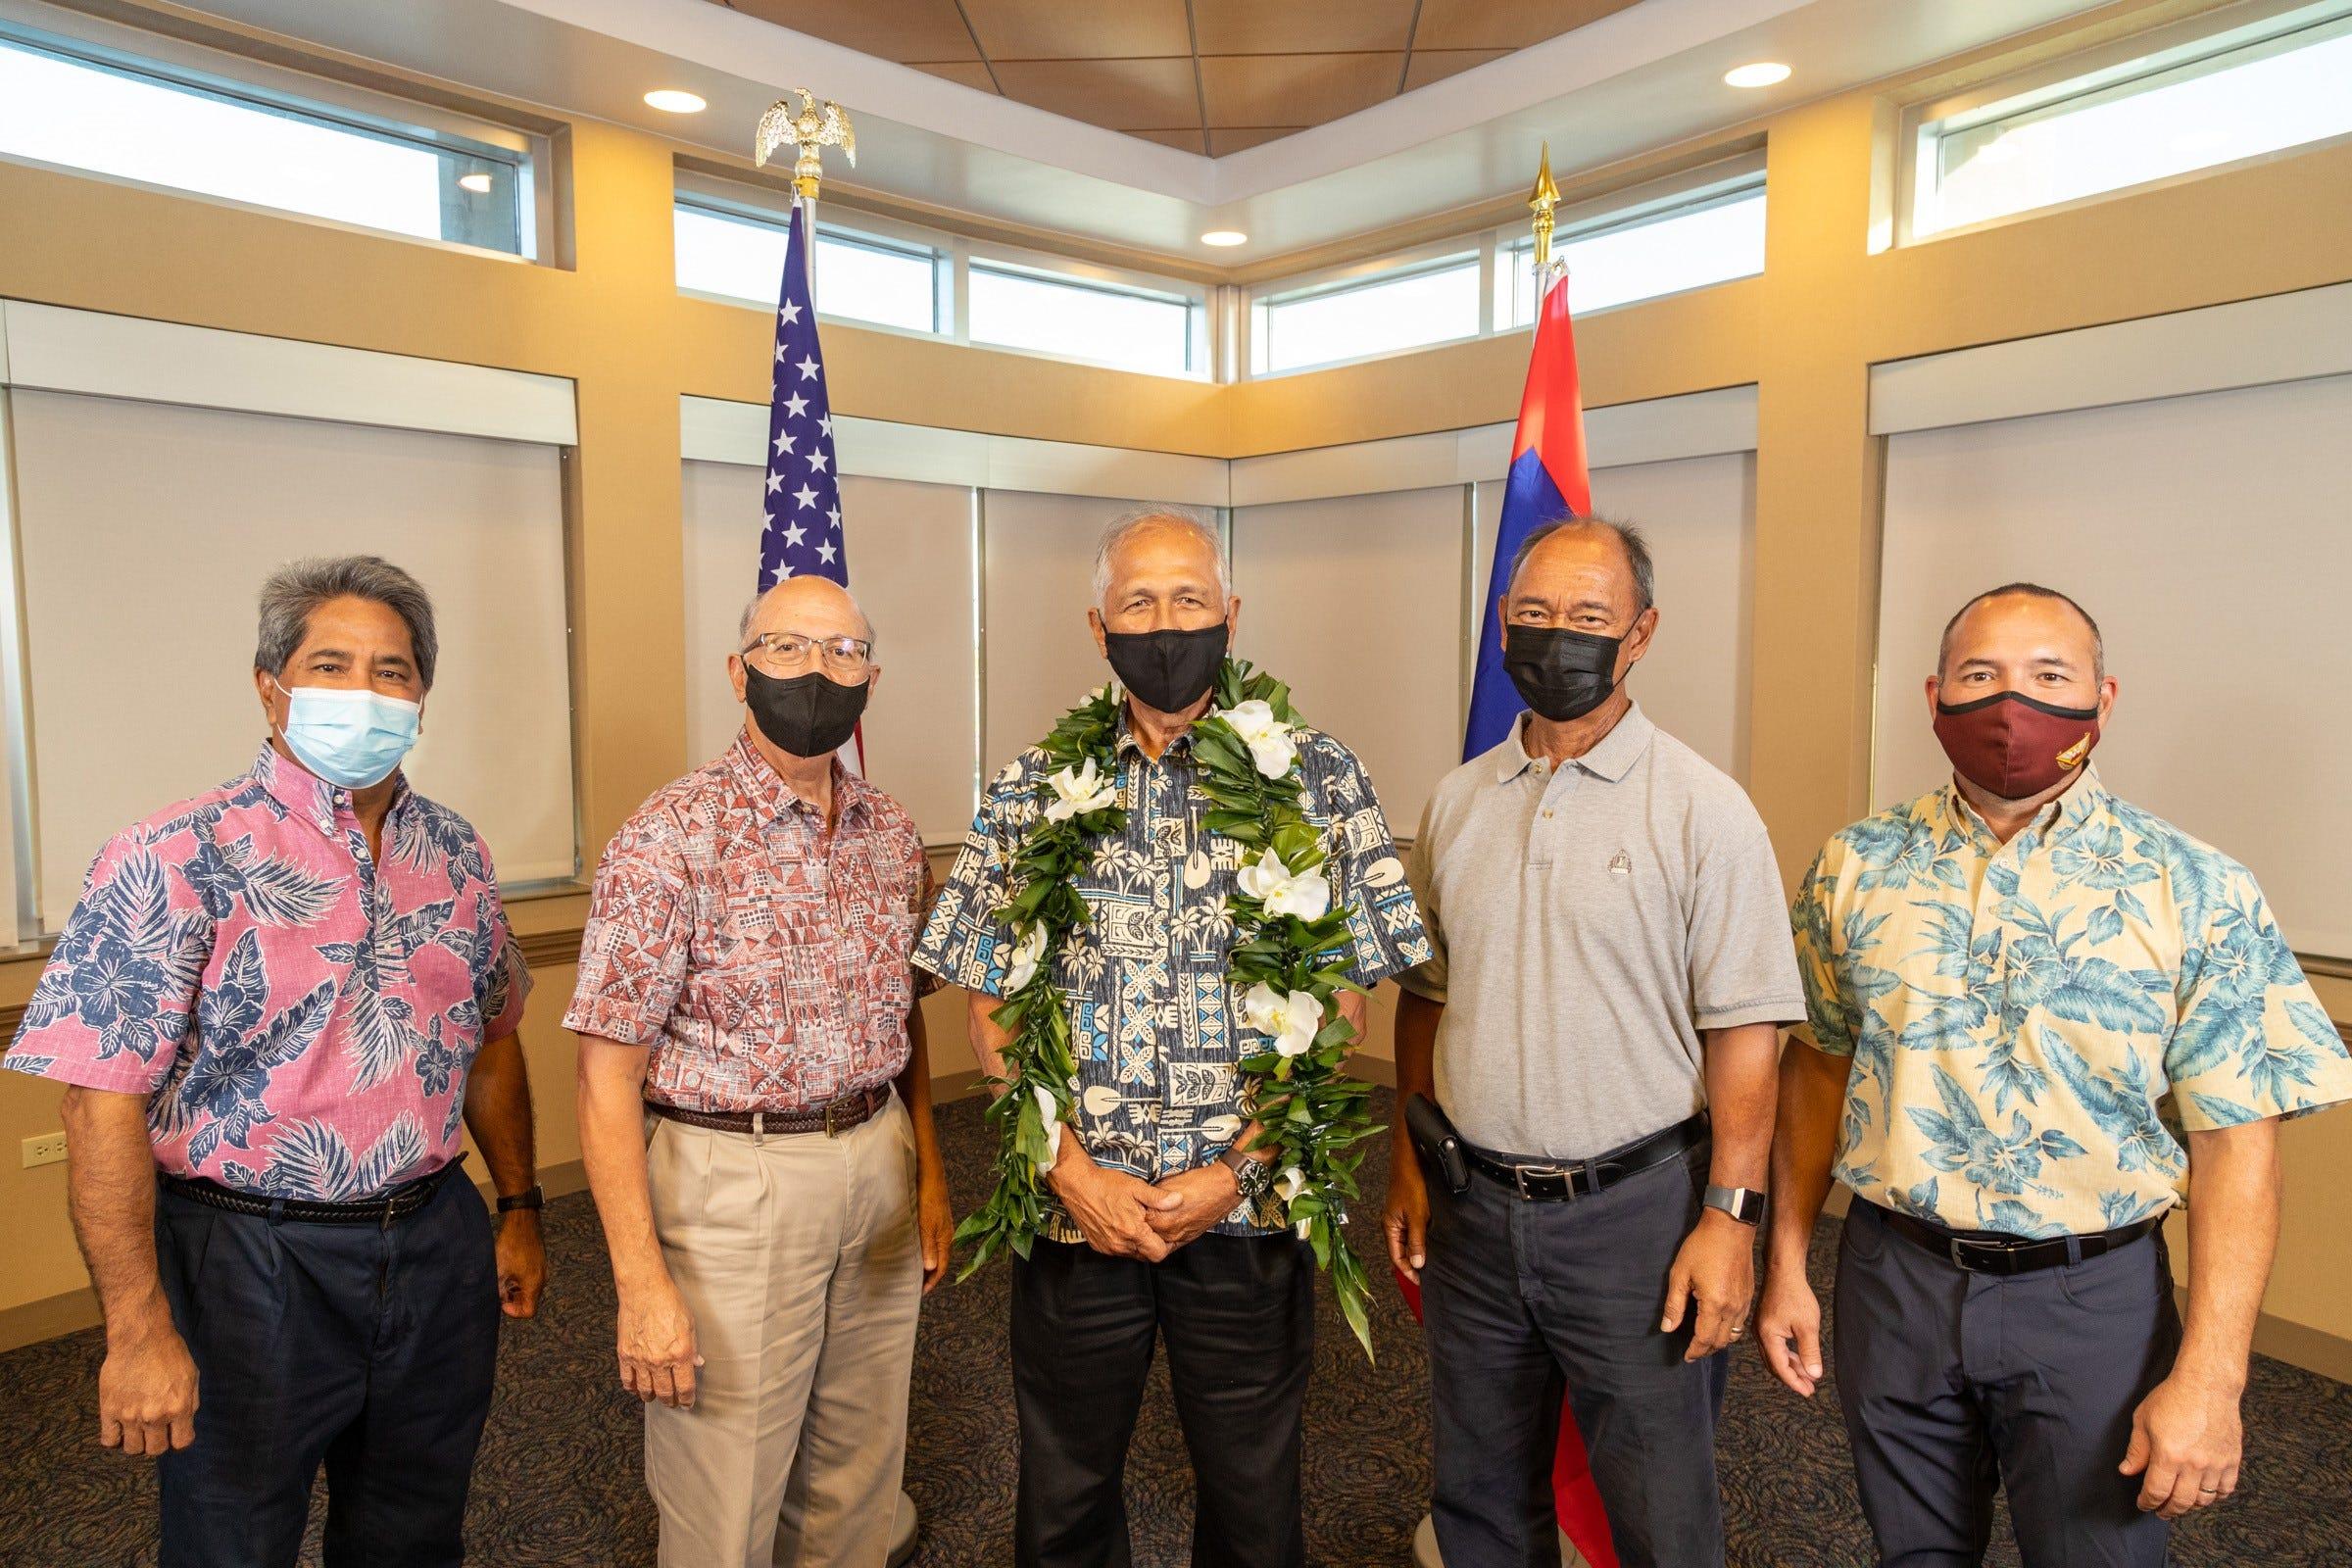 Guam Consolidated Commission on Utilities commissioners, from left: Francis Santos, Joseph Duenas, Pedro Roy Martinez, Simon Sanchez II and Michael Limtiaco.